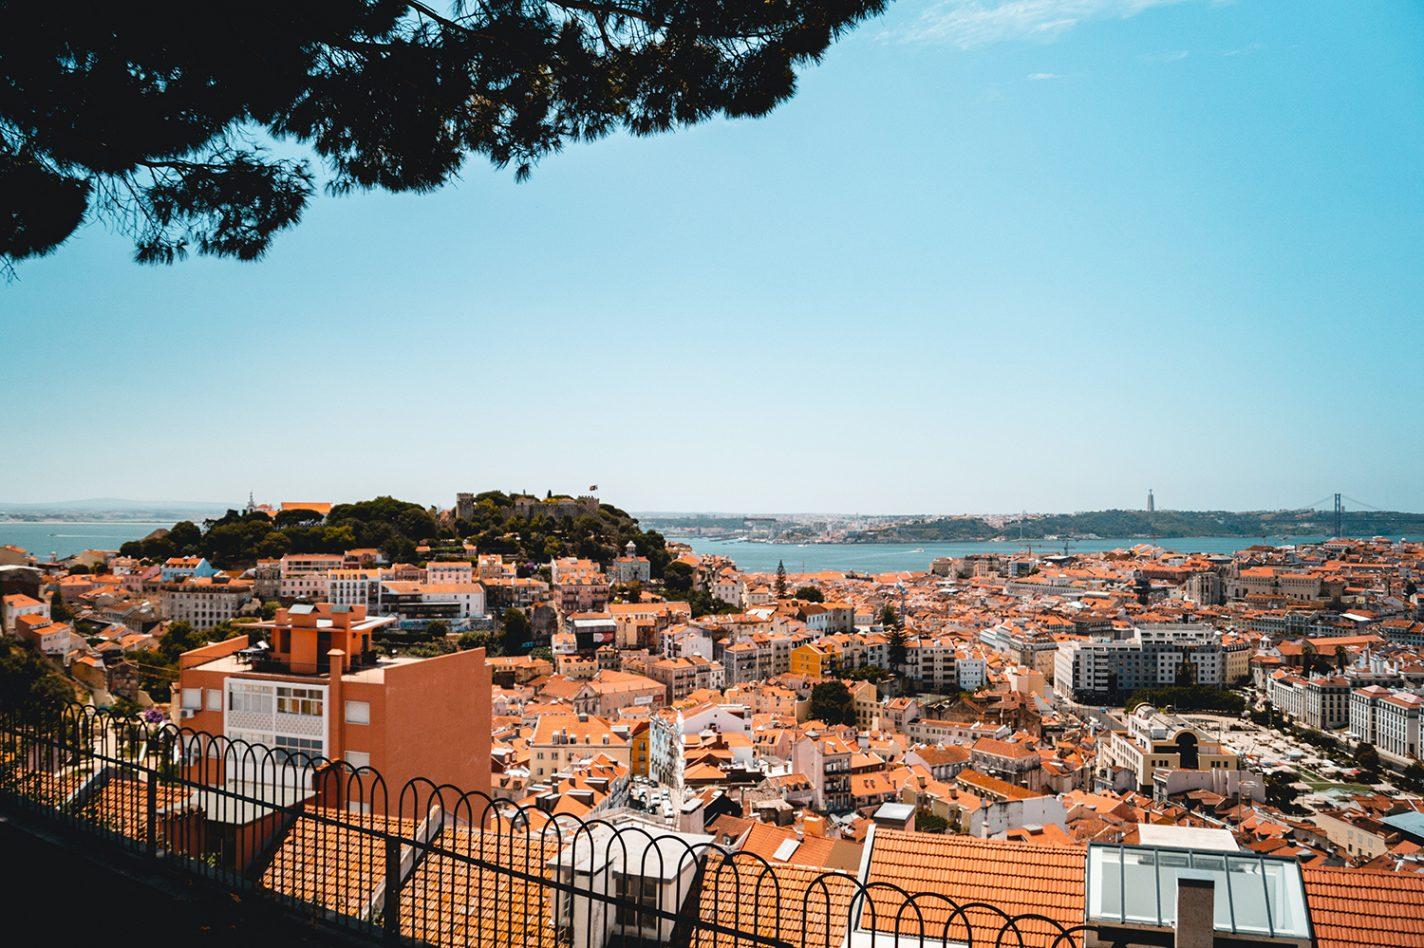 Uitzicht vanaf Castelo de São Jorge